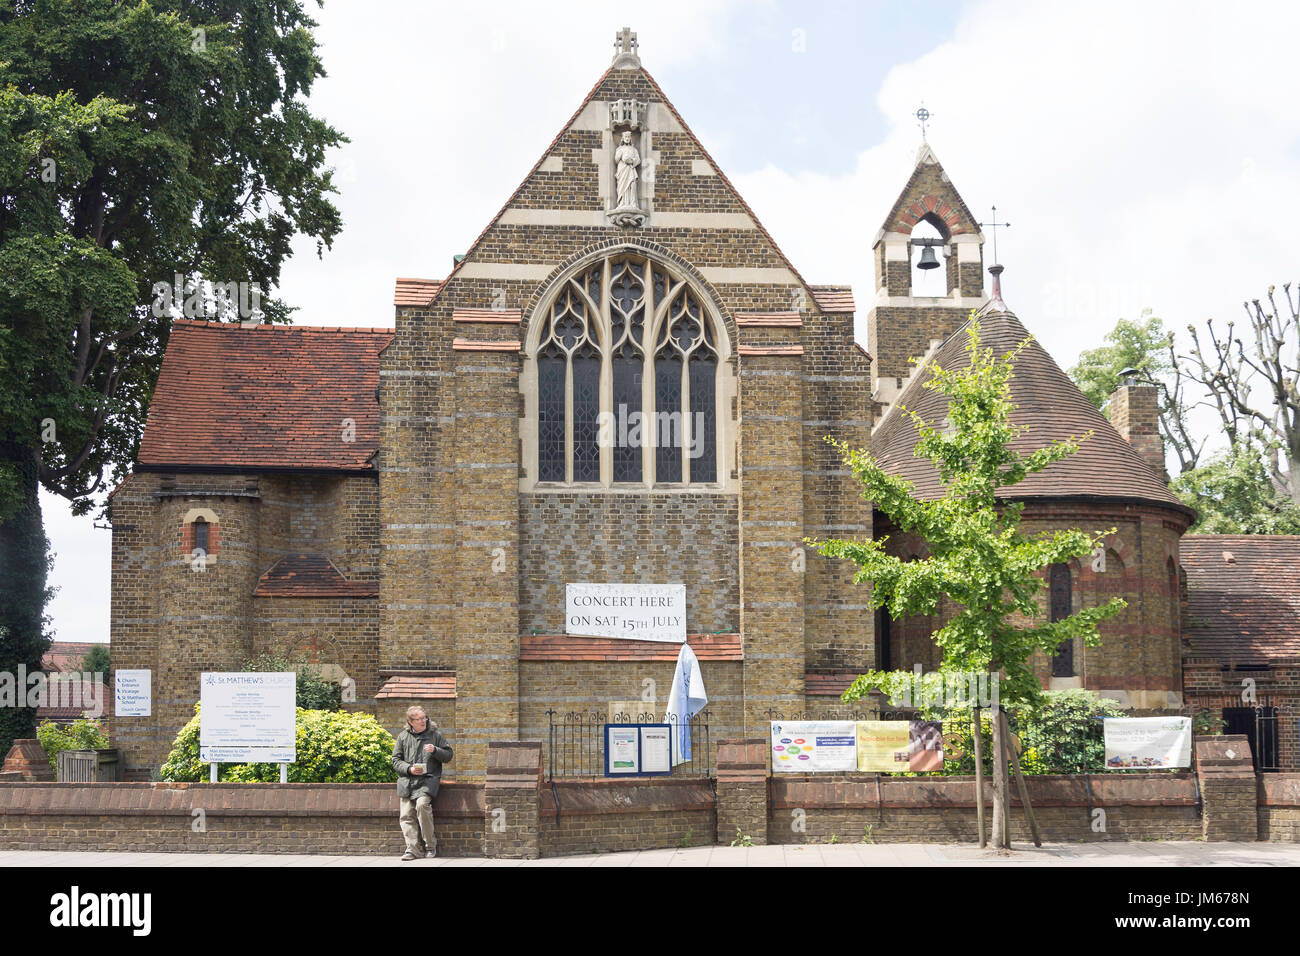 St. Matthew's Church, High Street, Yiewsley, London Borough of Hillingdon, Greater London, England, United Kingdom - Stock Image